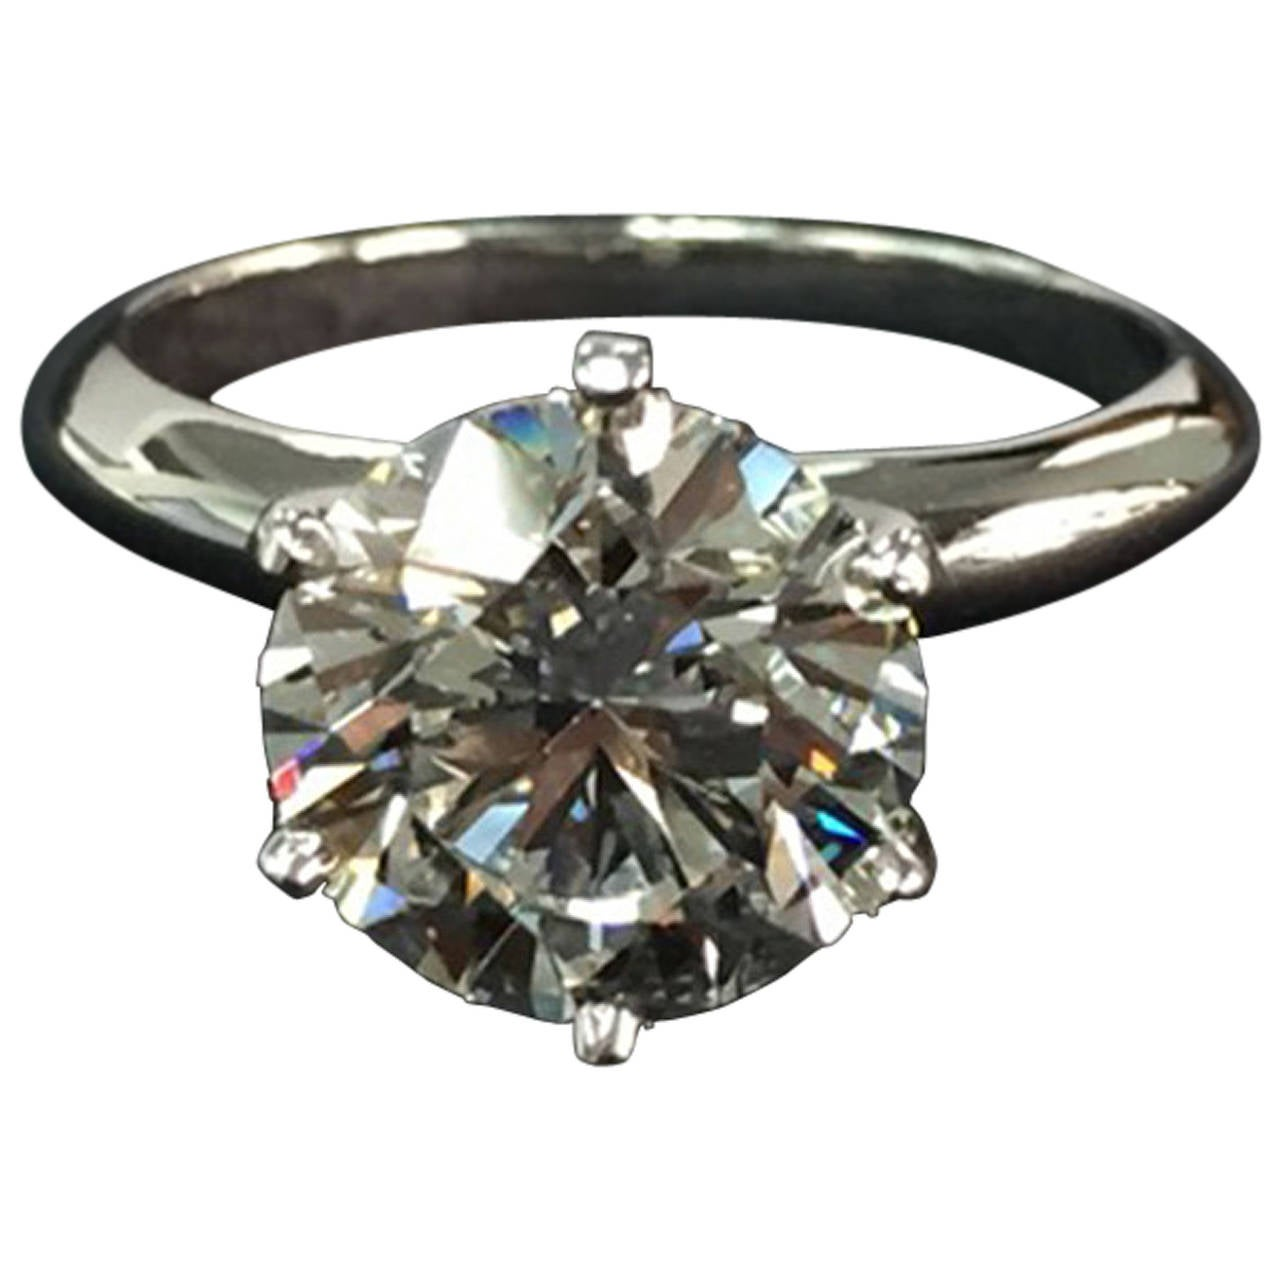 Tiffany and Co 3 32 Carat Diamond Platinum Engagement Ring at 1stdibs